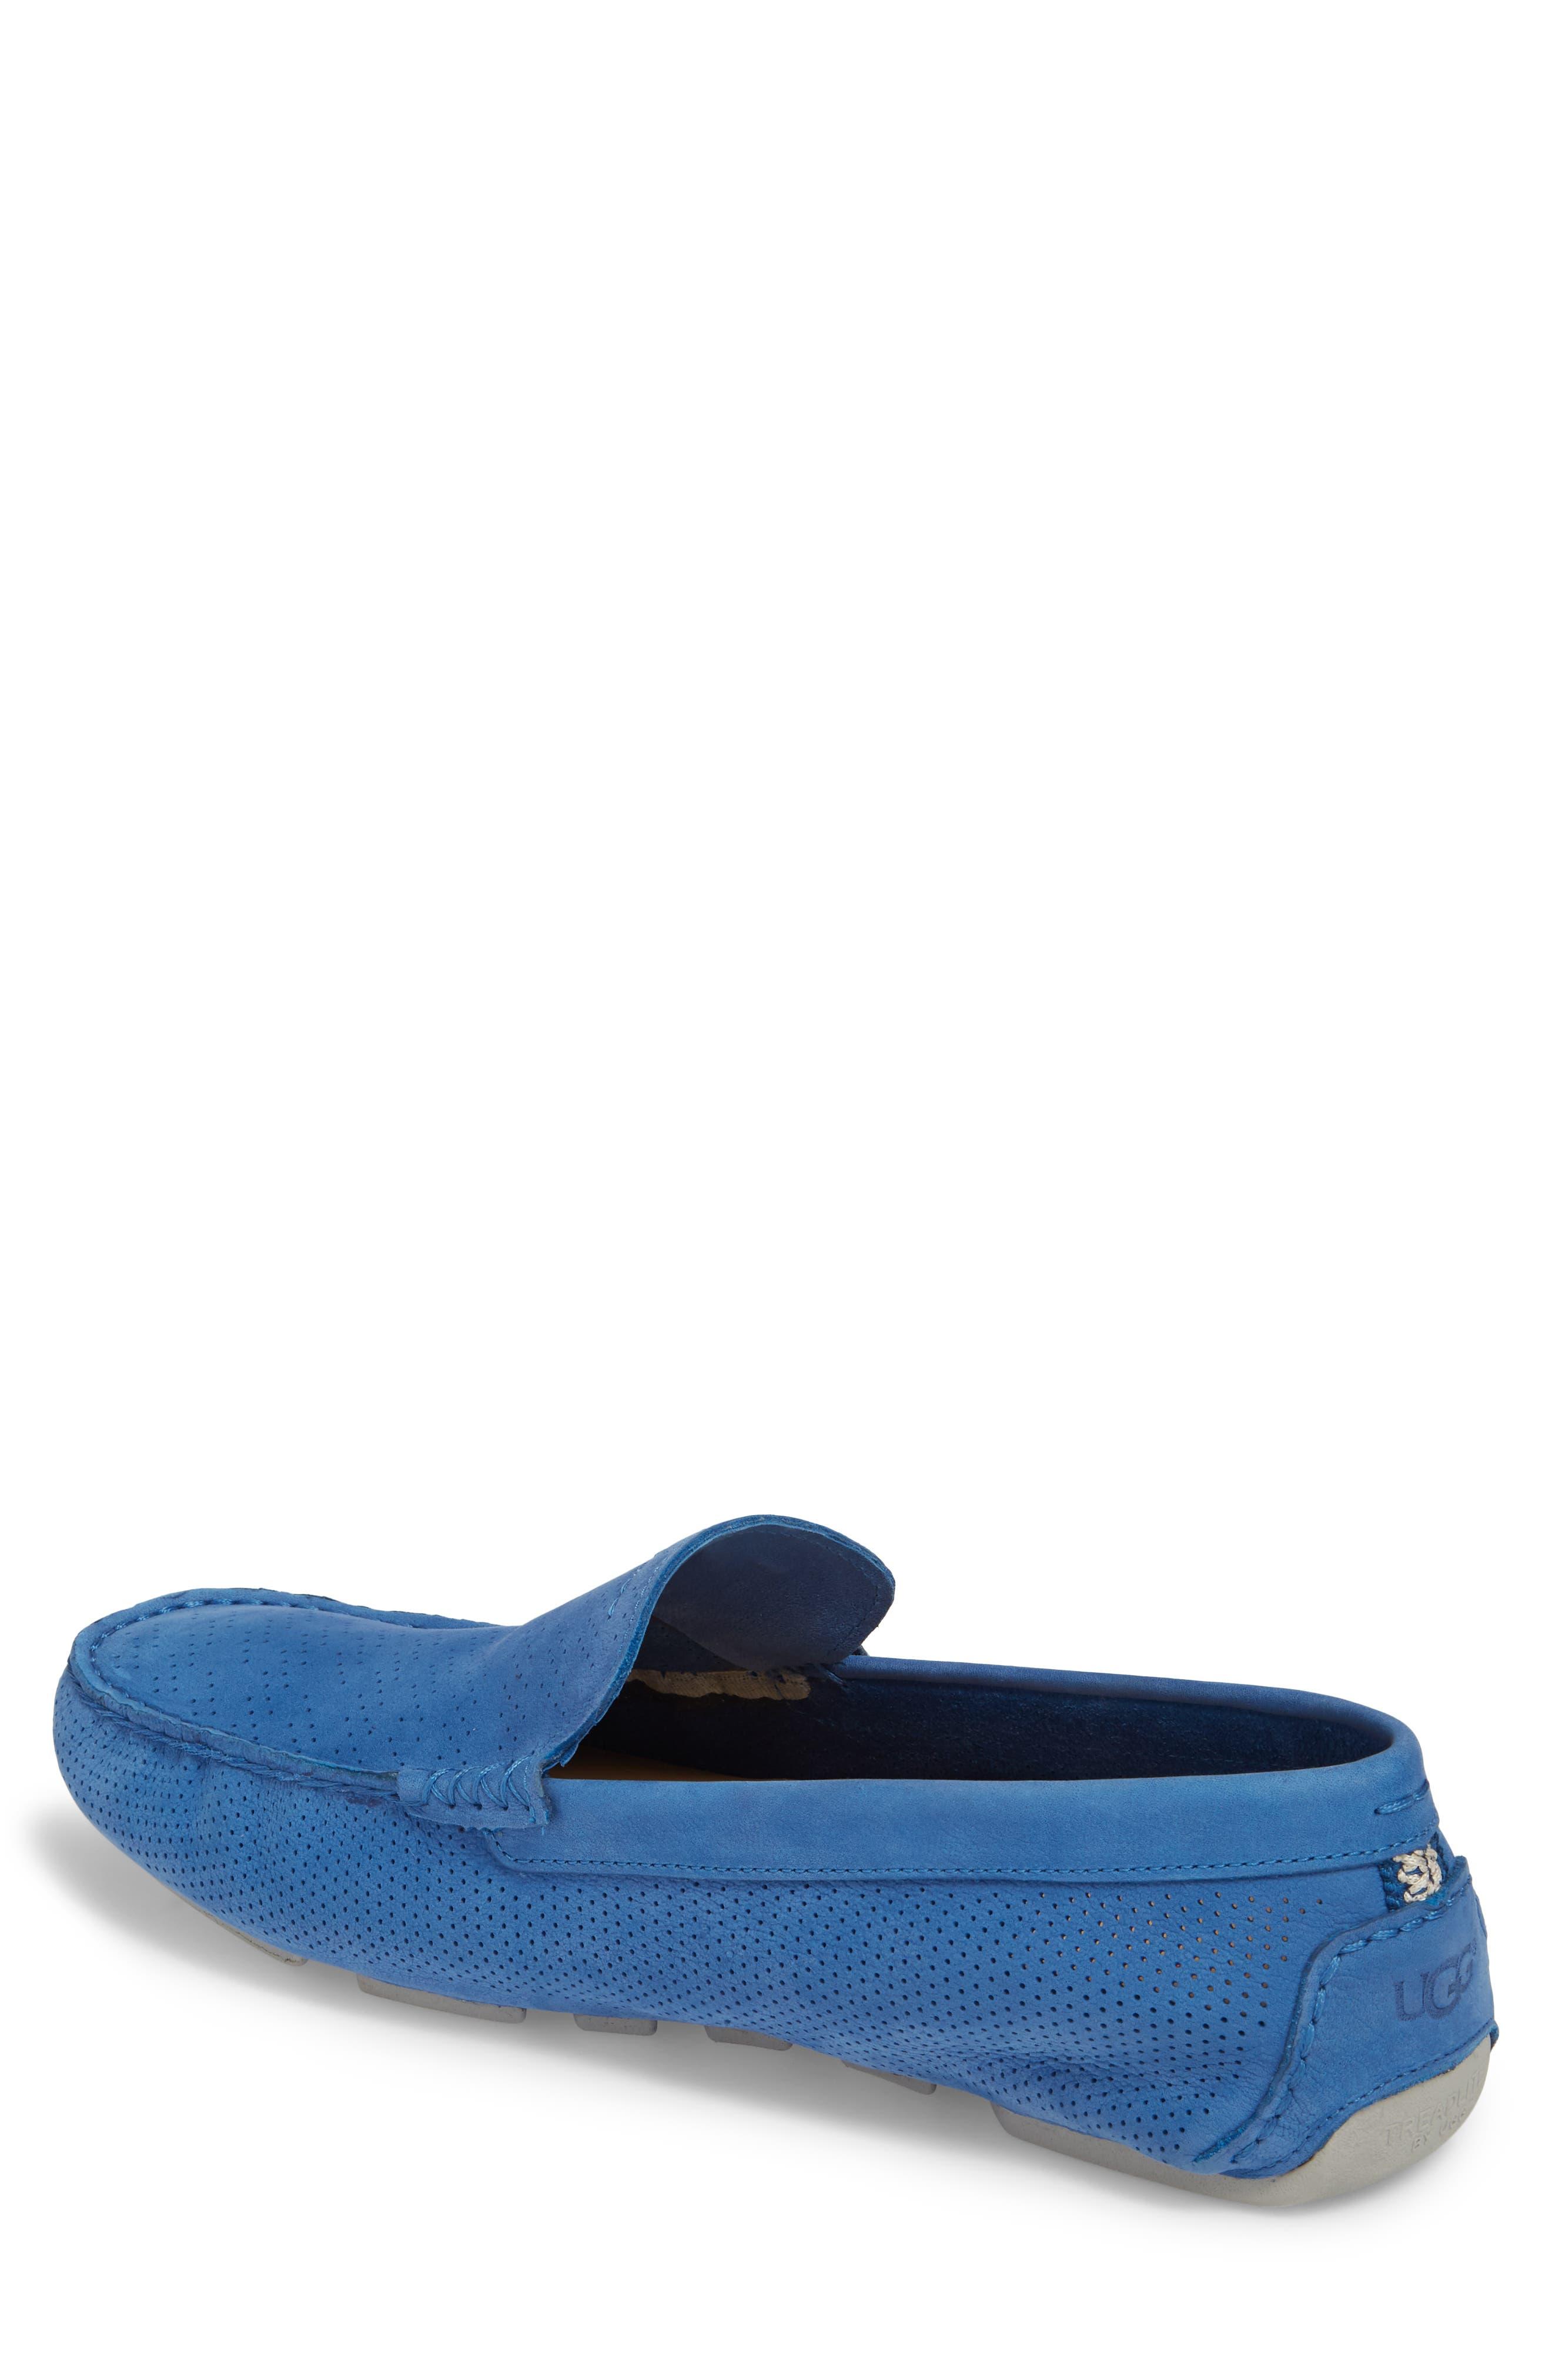 Alternate Image 2  - UGG® Henrick Twinsole® Driving Shoe (Men)